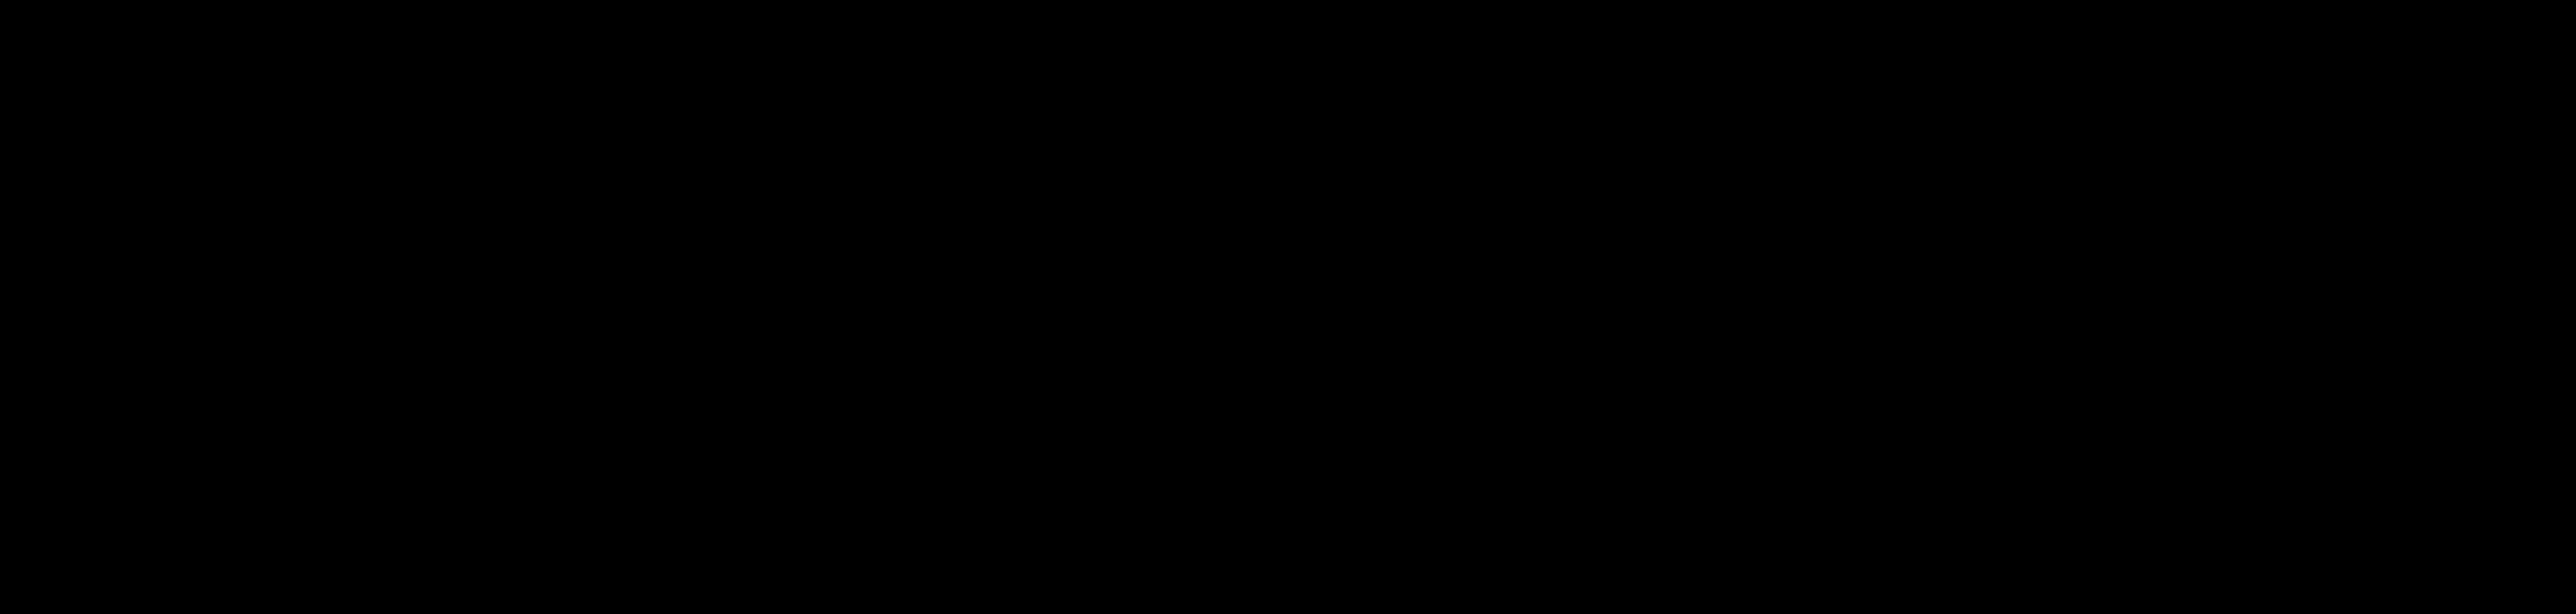 amd logo 1 - AMD Logo